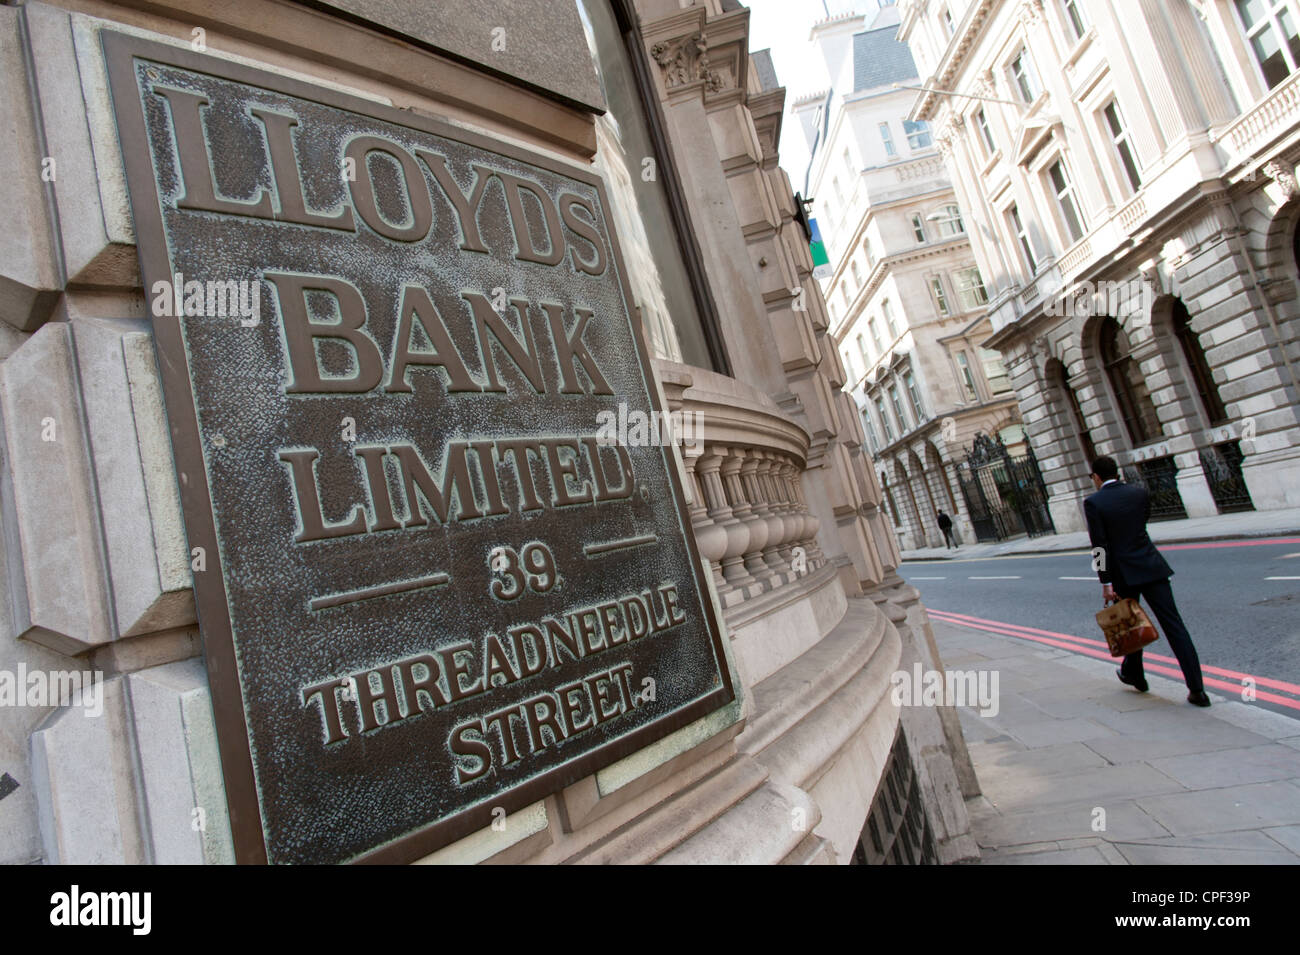 Lloyds Bank on Threadneedle Street, London, England, UK - Stock Image